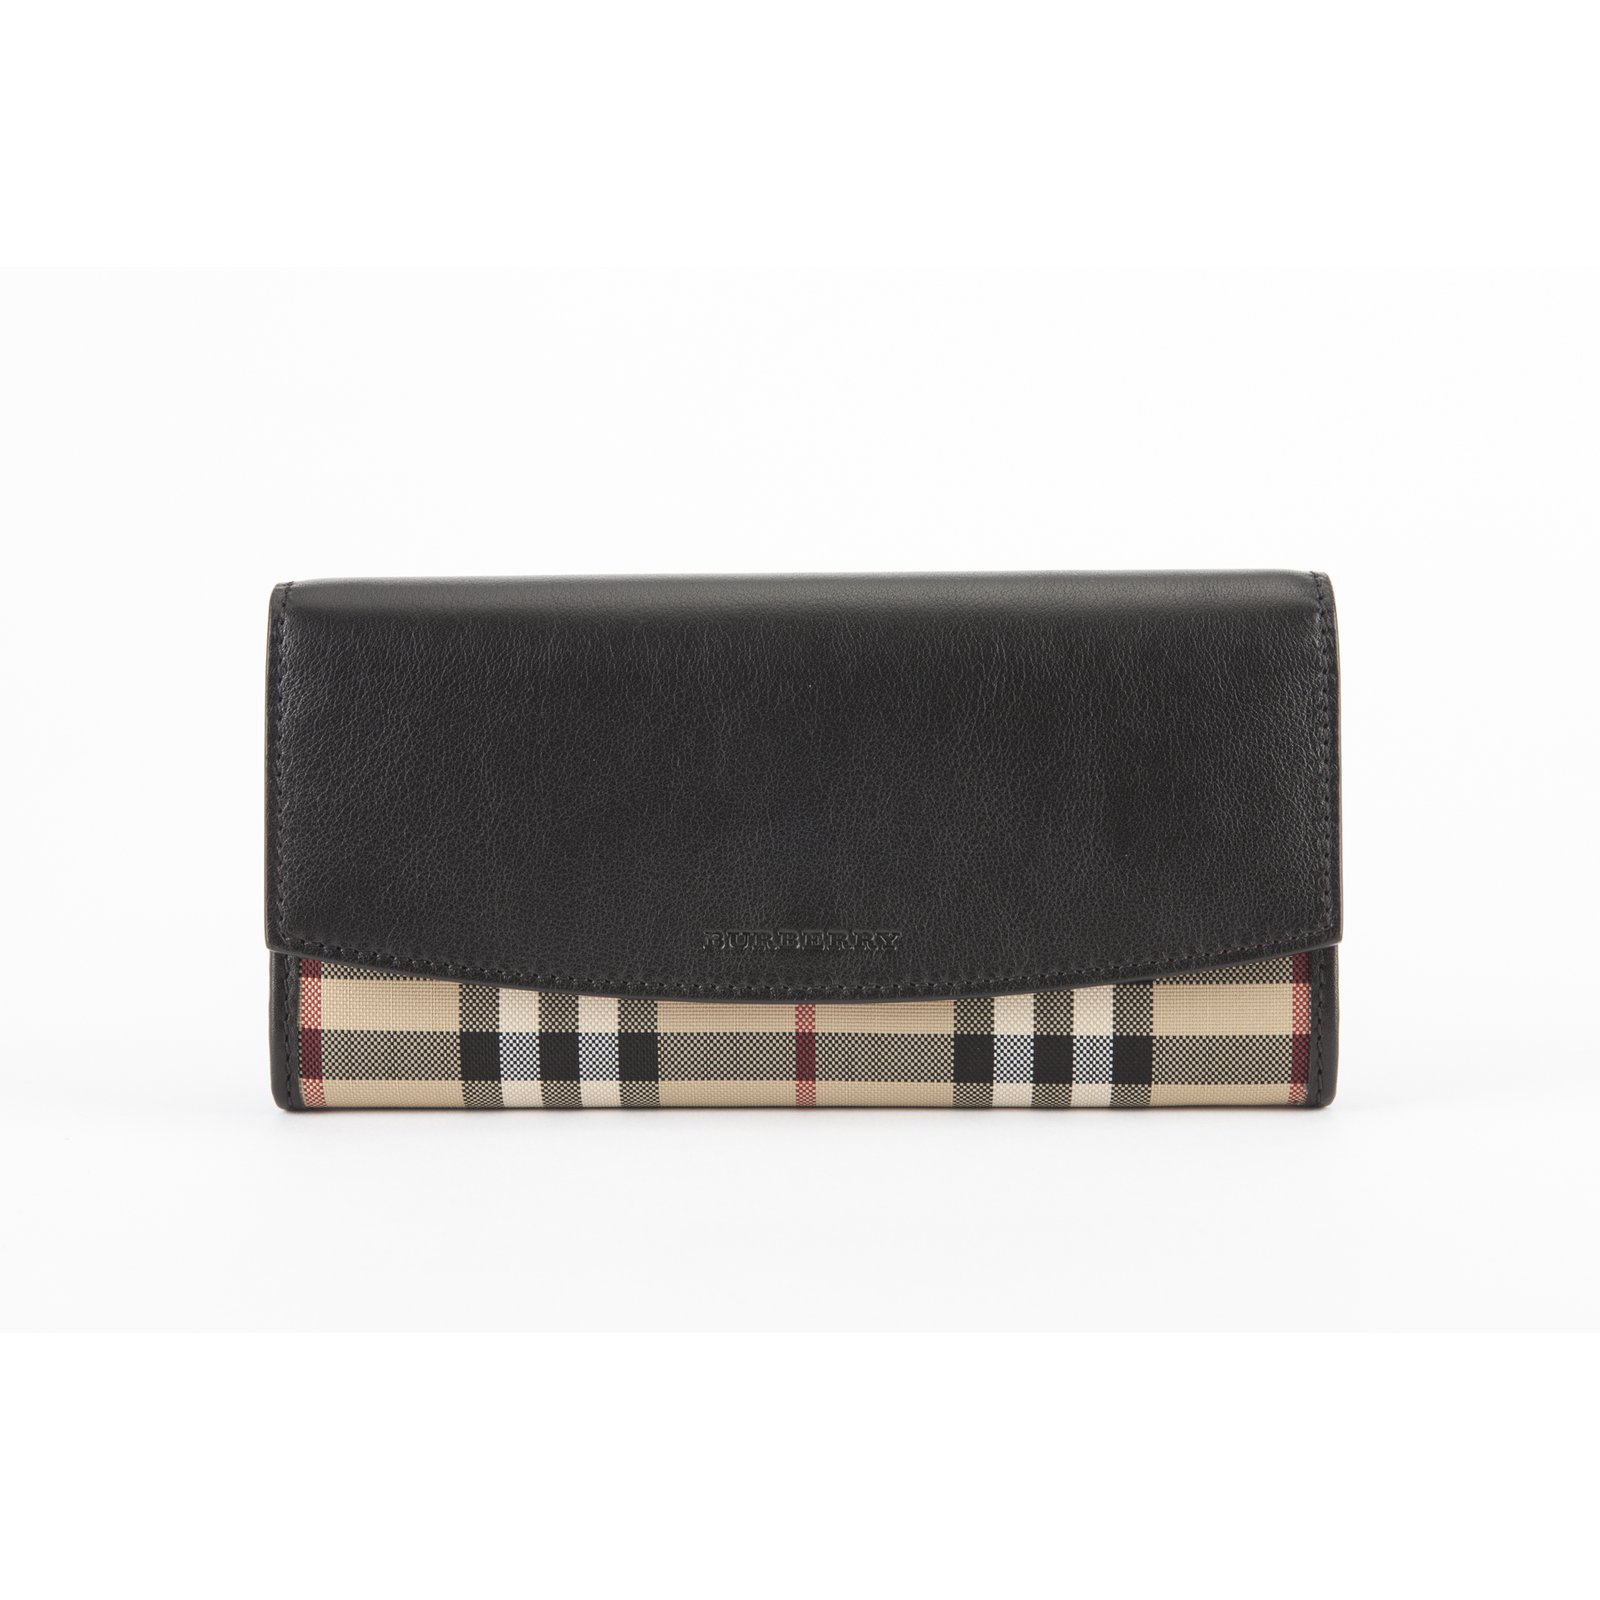 24171a1e9330 Burberry Wallets Wallets Leather Black ref.14492 - Joli Closet